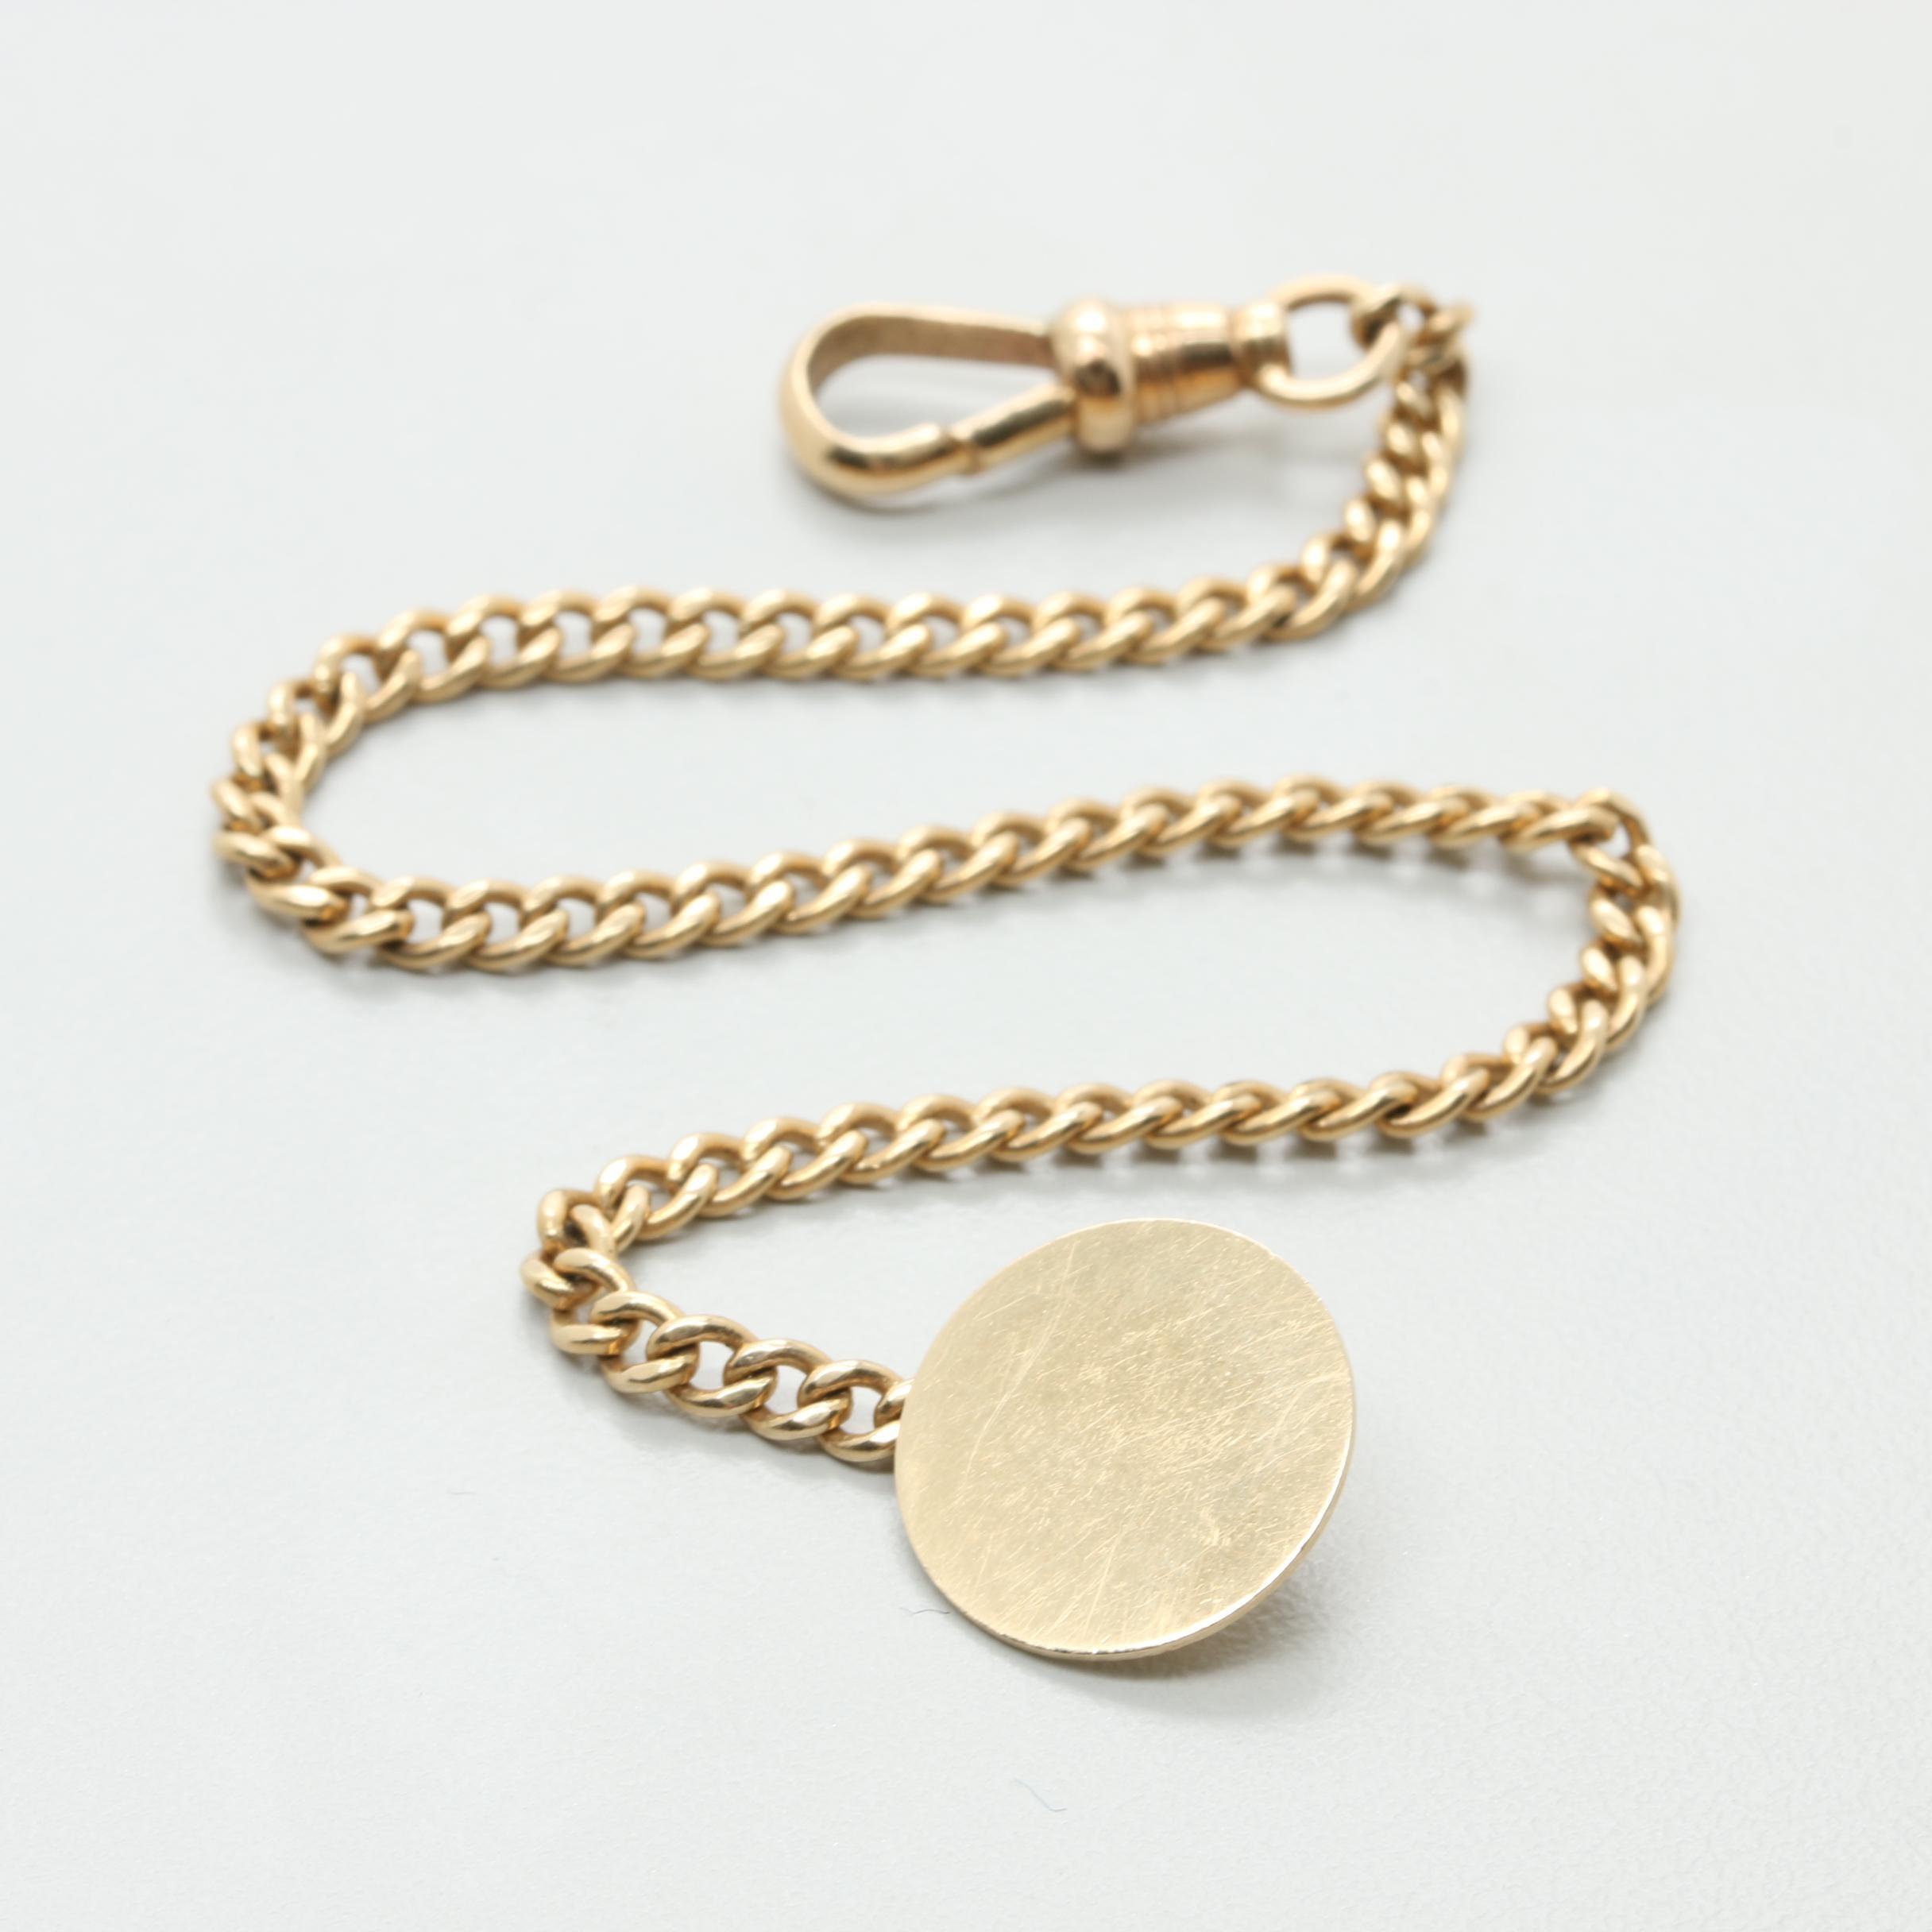 14K Yellow Gold Watch Chain